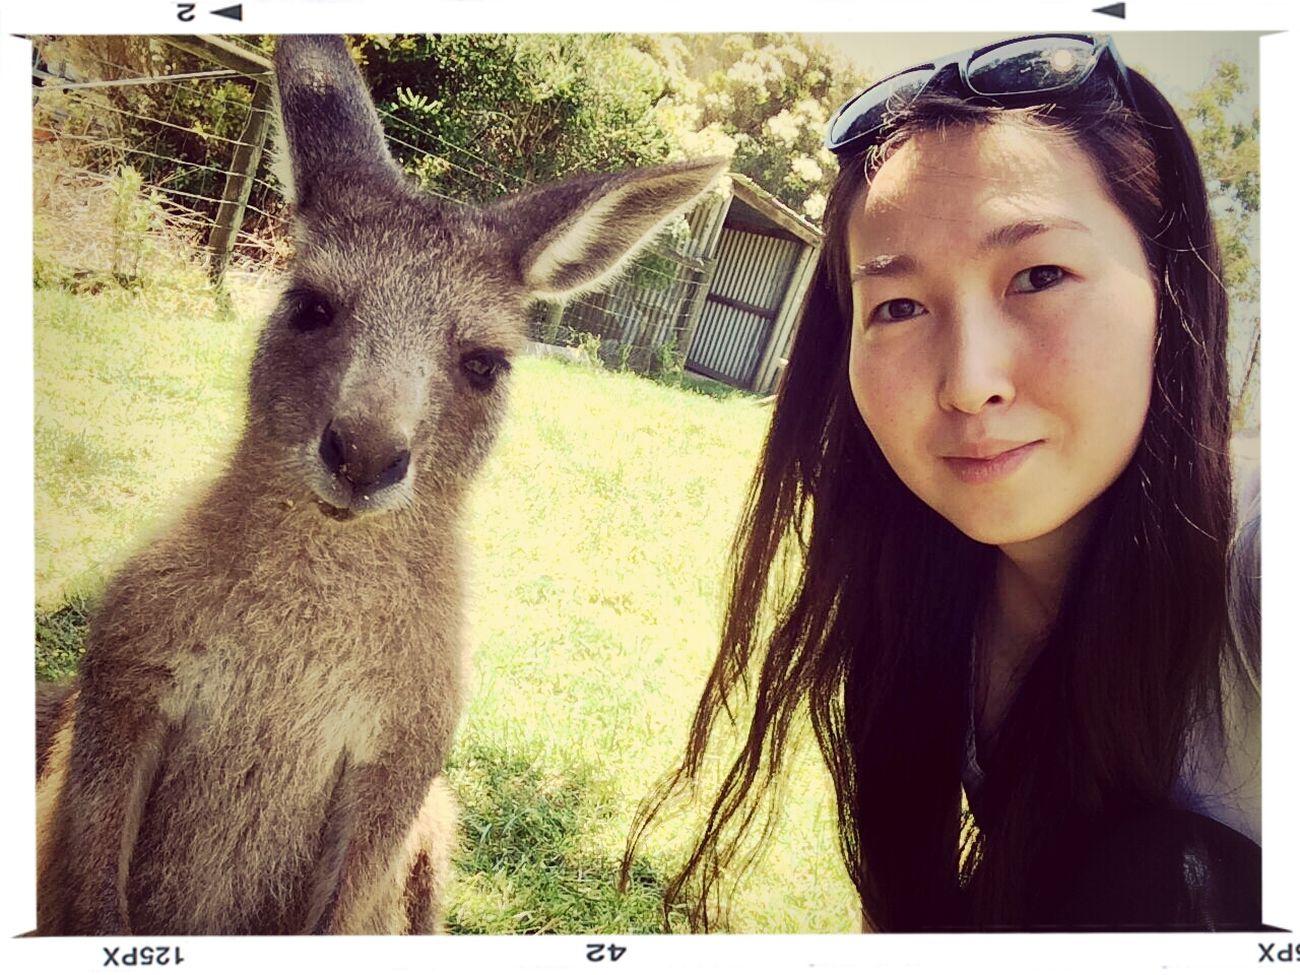 Selfie hiij chadhuu? yaj hiidgiin harhuu? KangarooJack Funday Melbourne Wildselfie